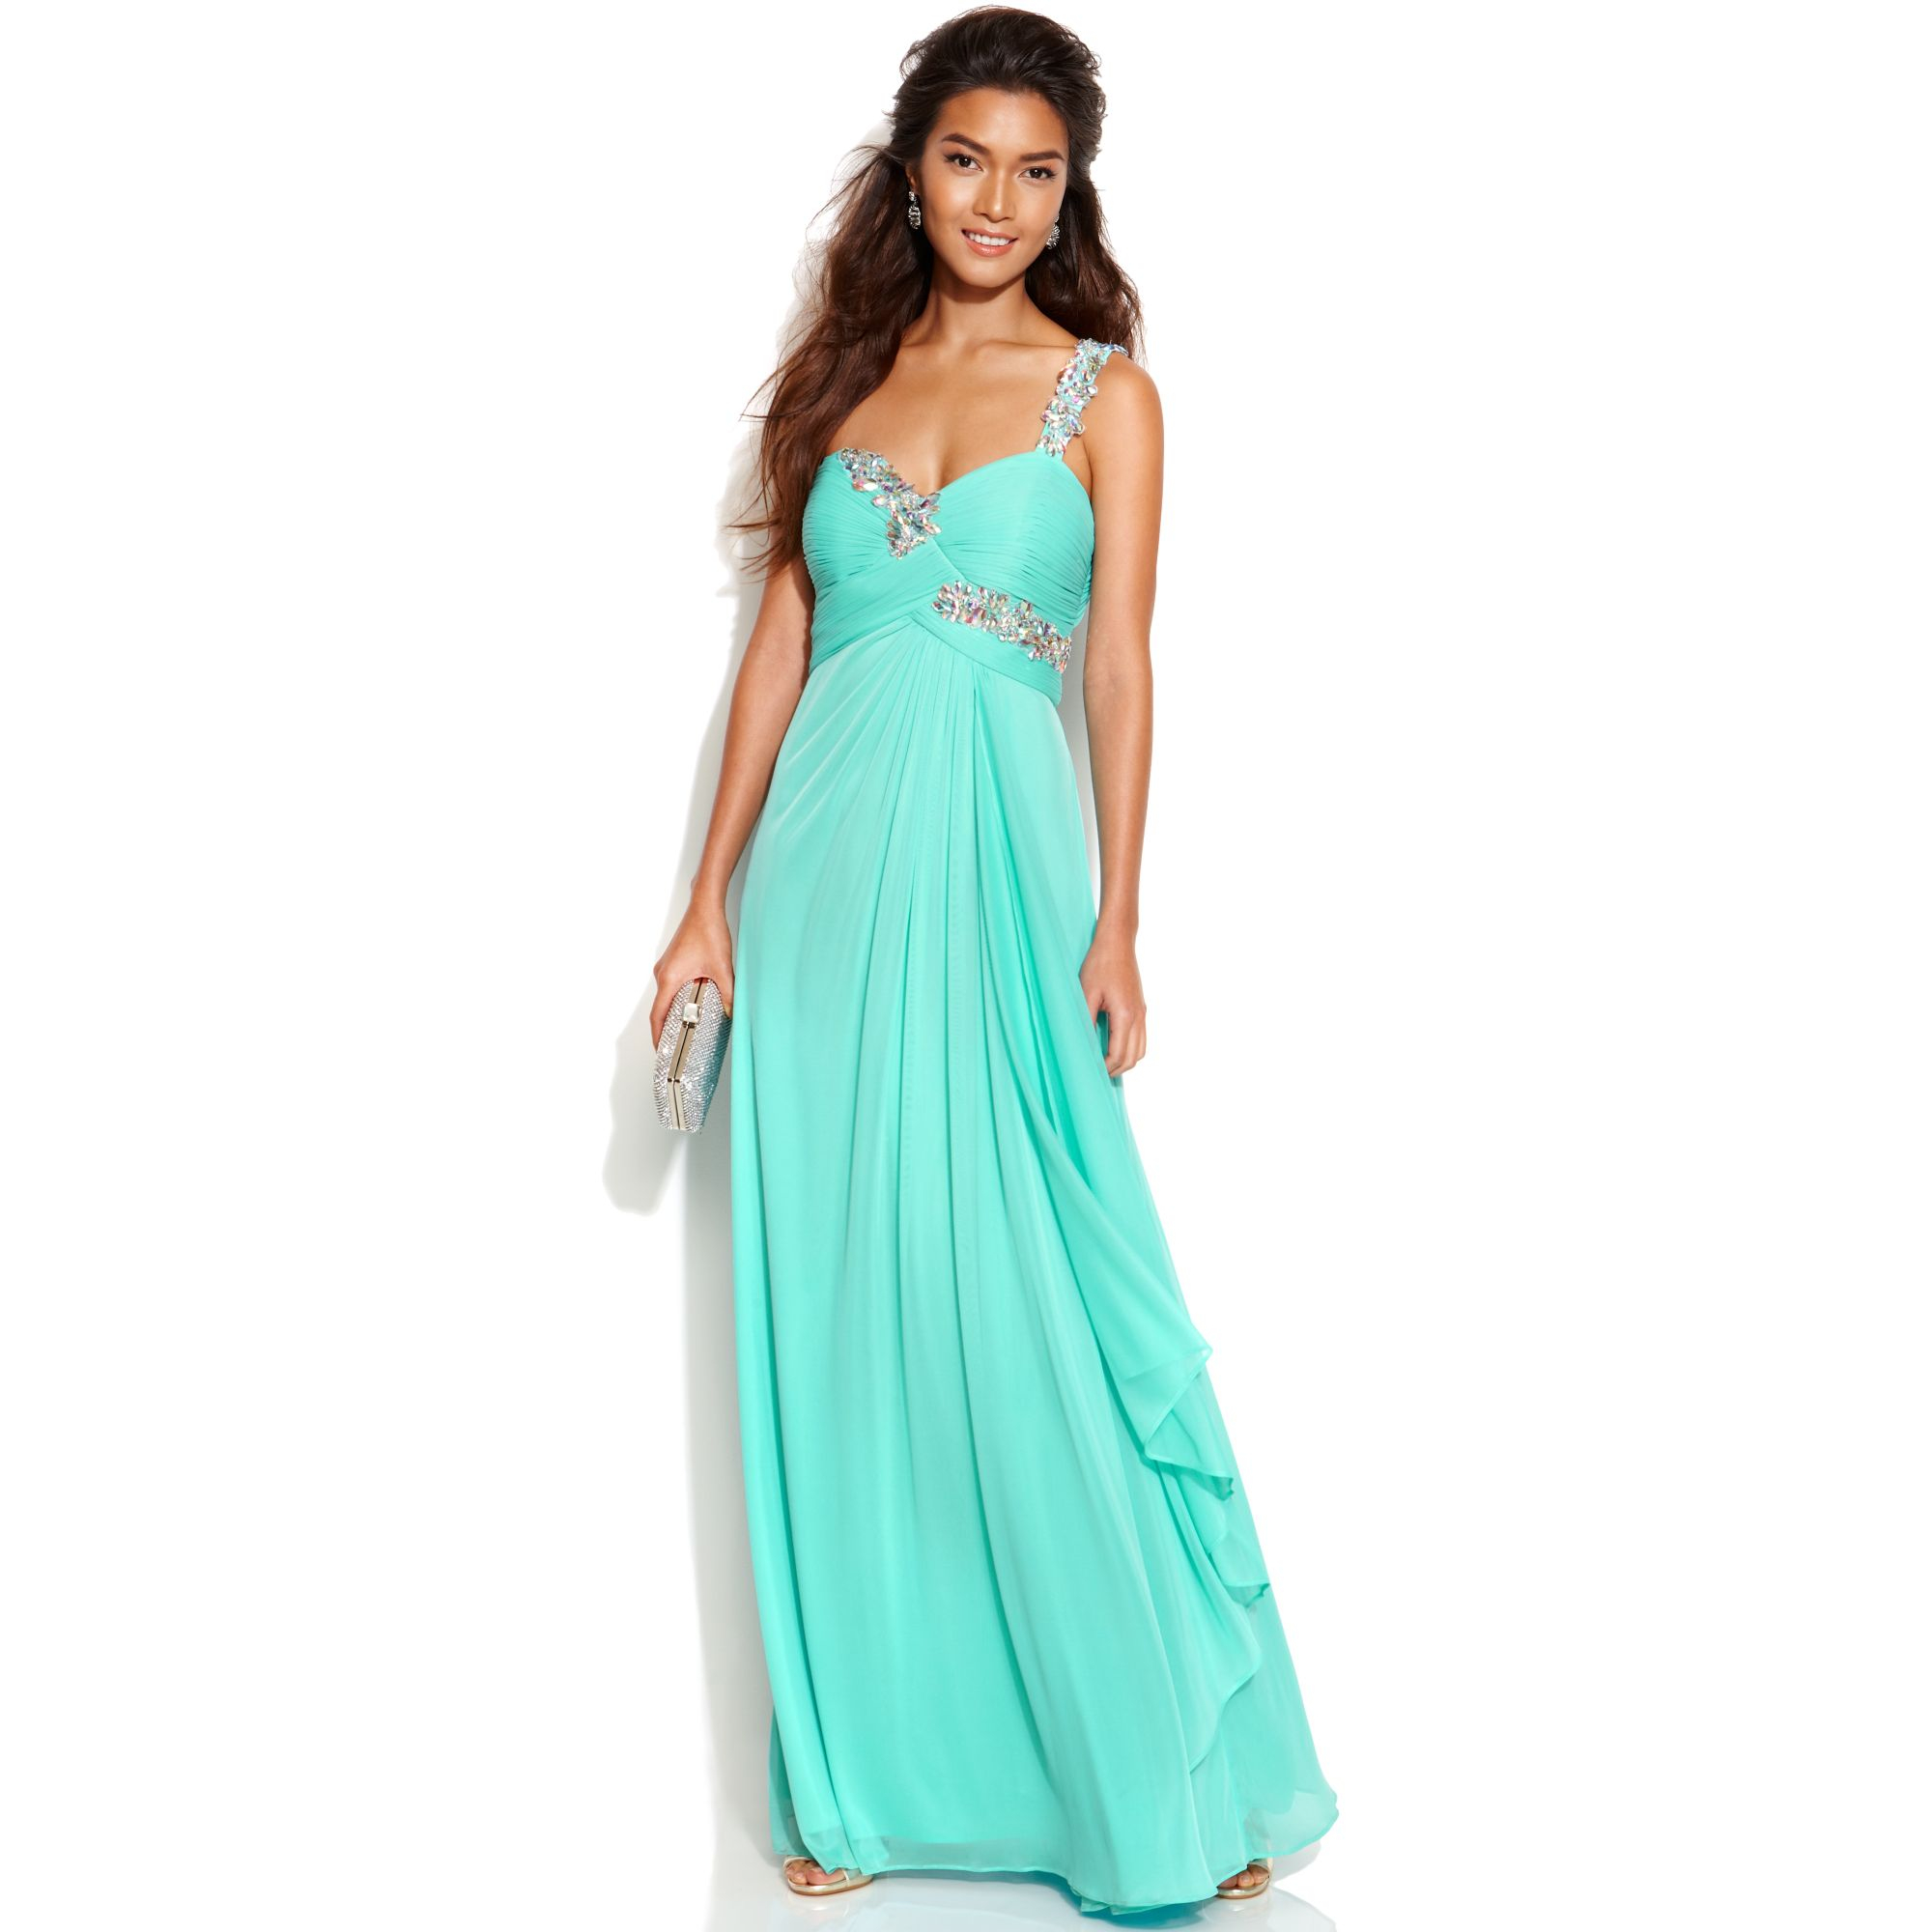 Lyst - Xscape One Shoulder Jewel Trim Gown in Green